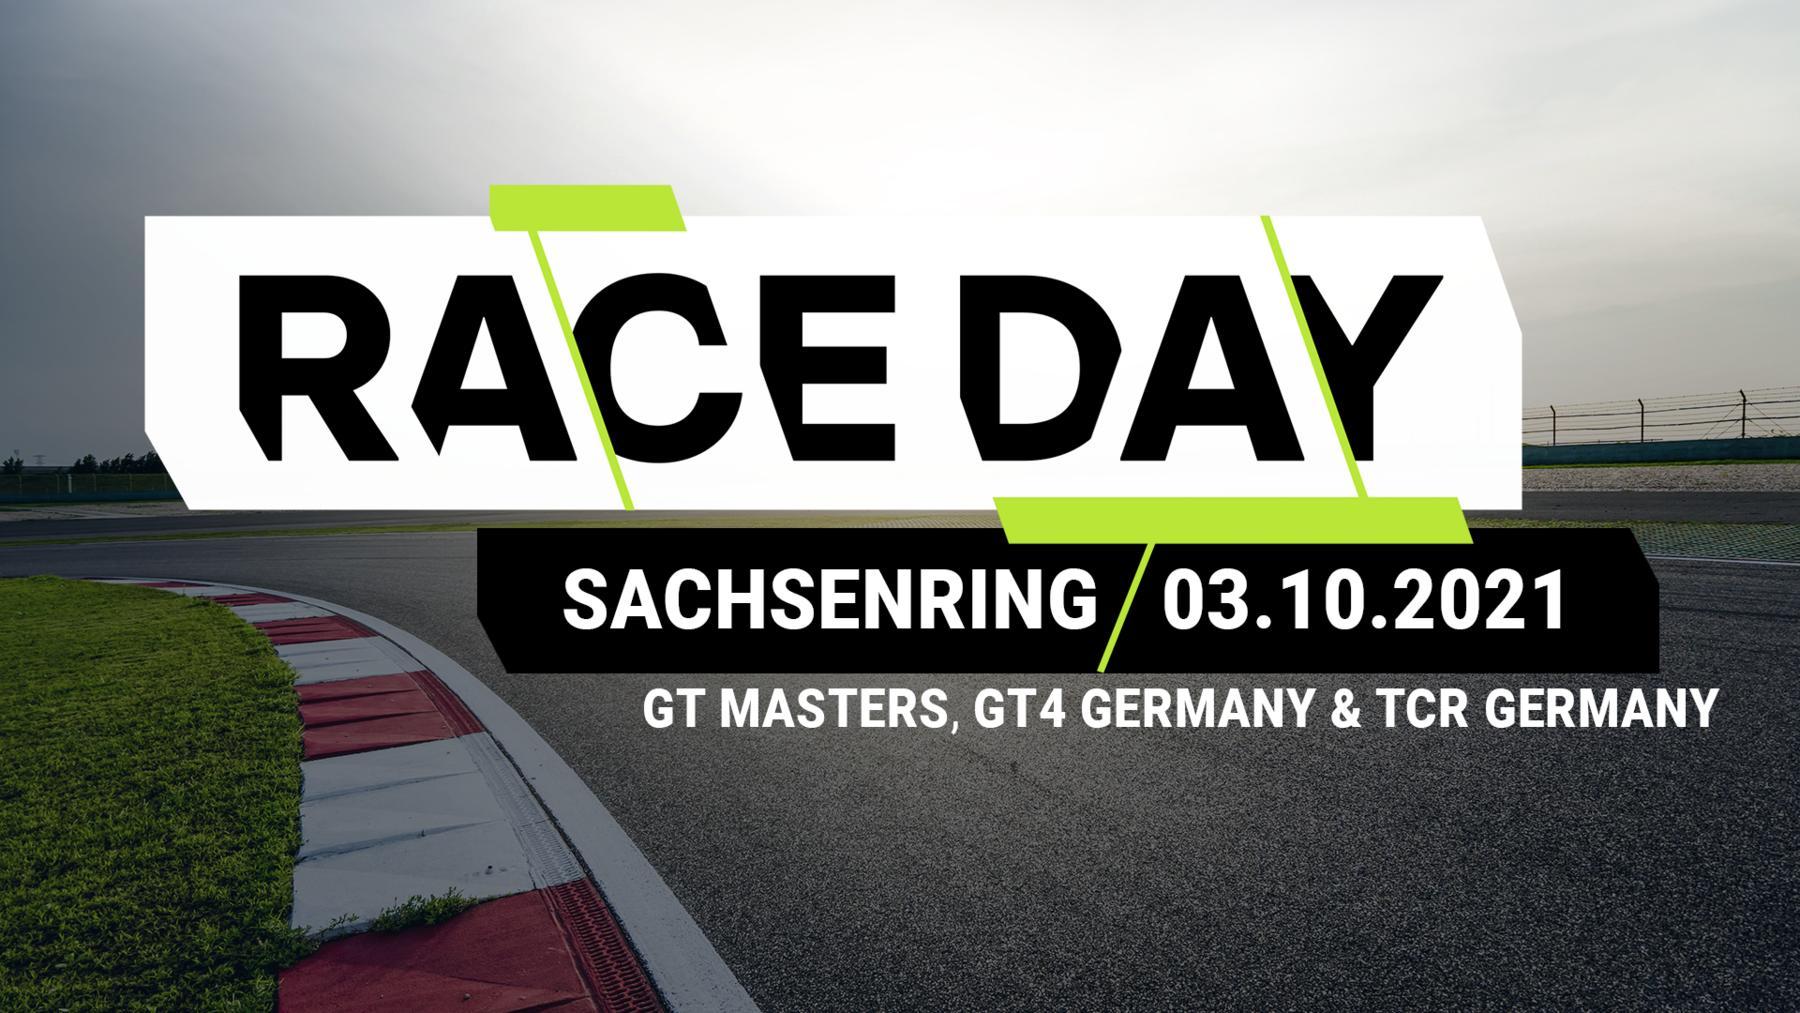 Raceday - Sachsenring